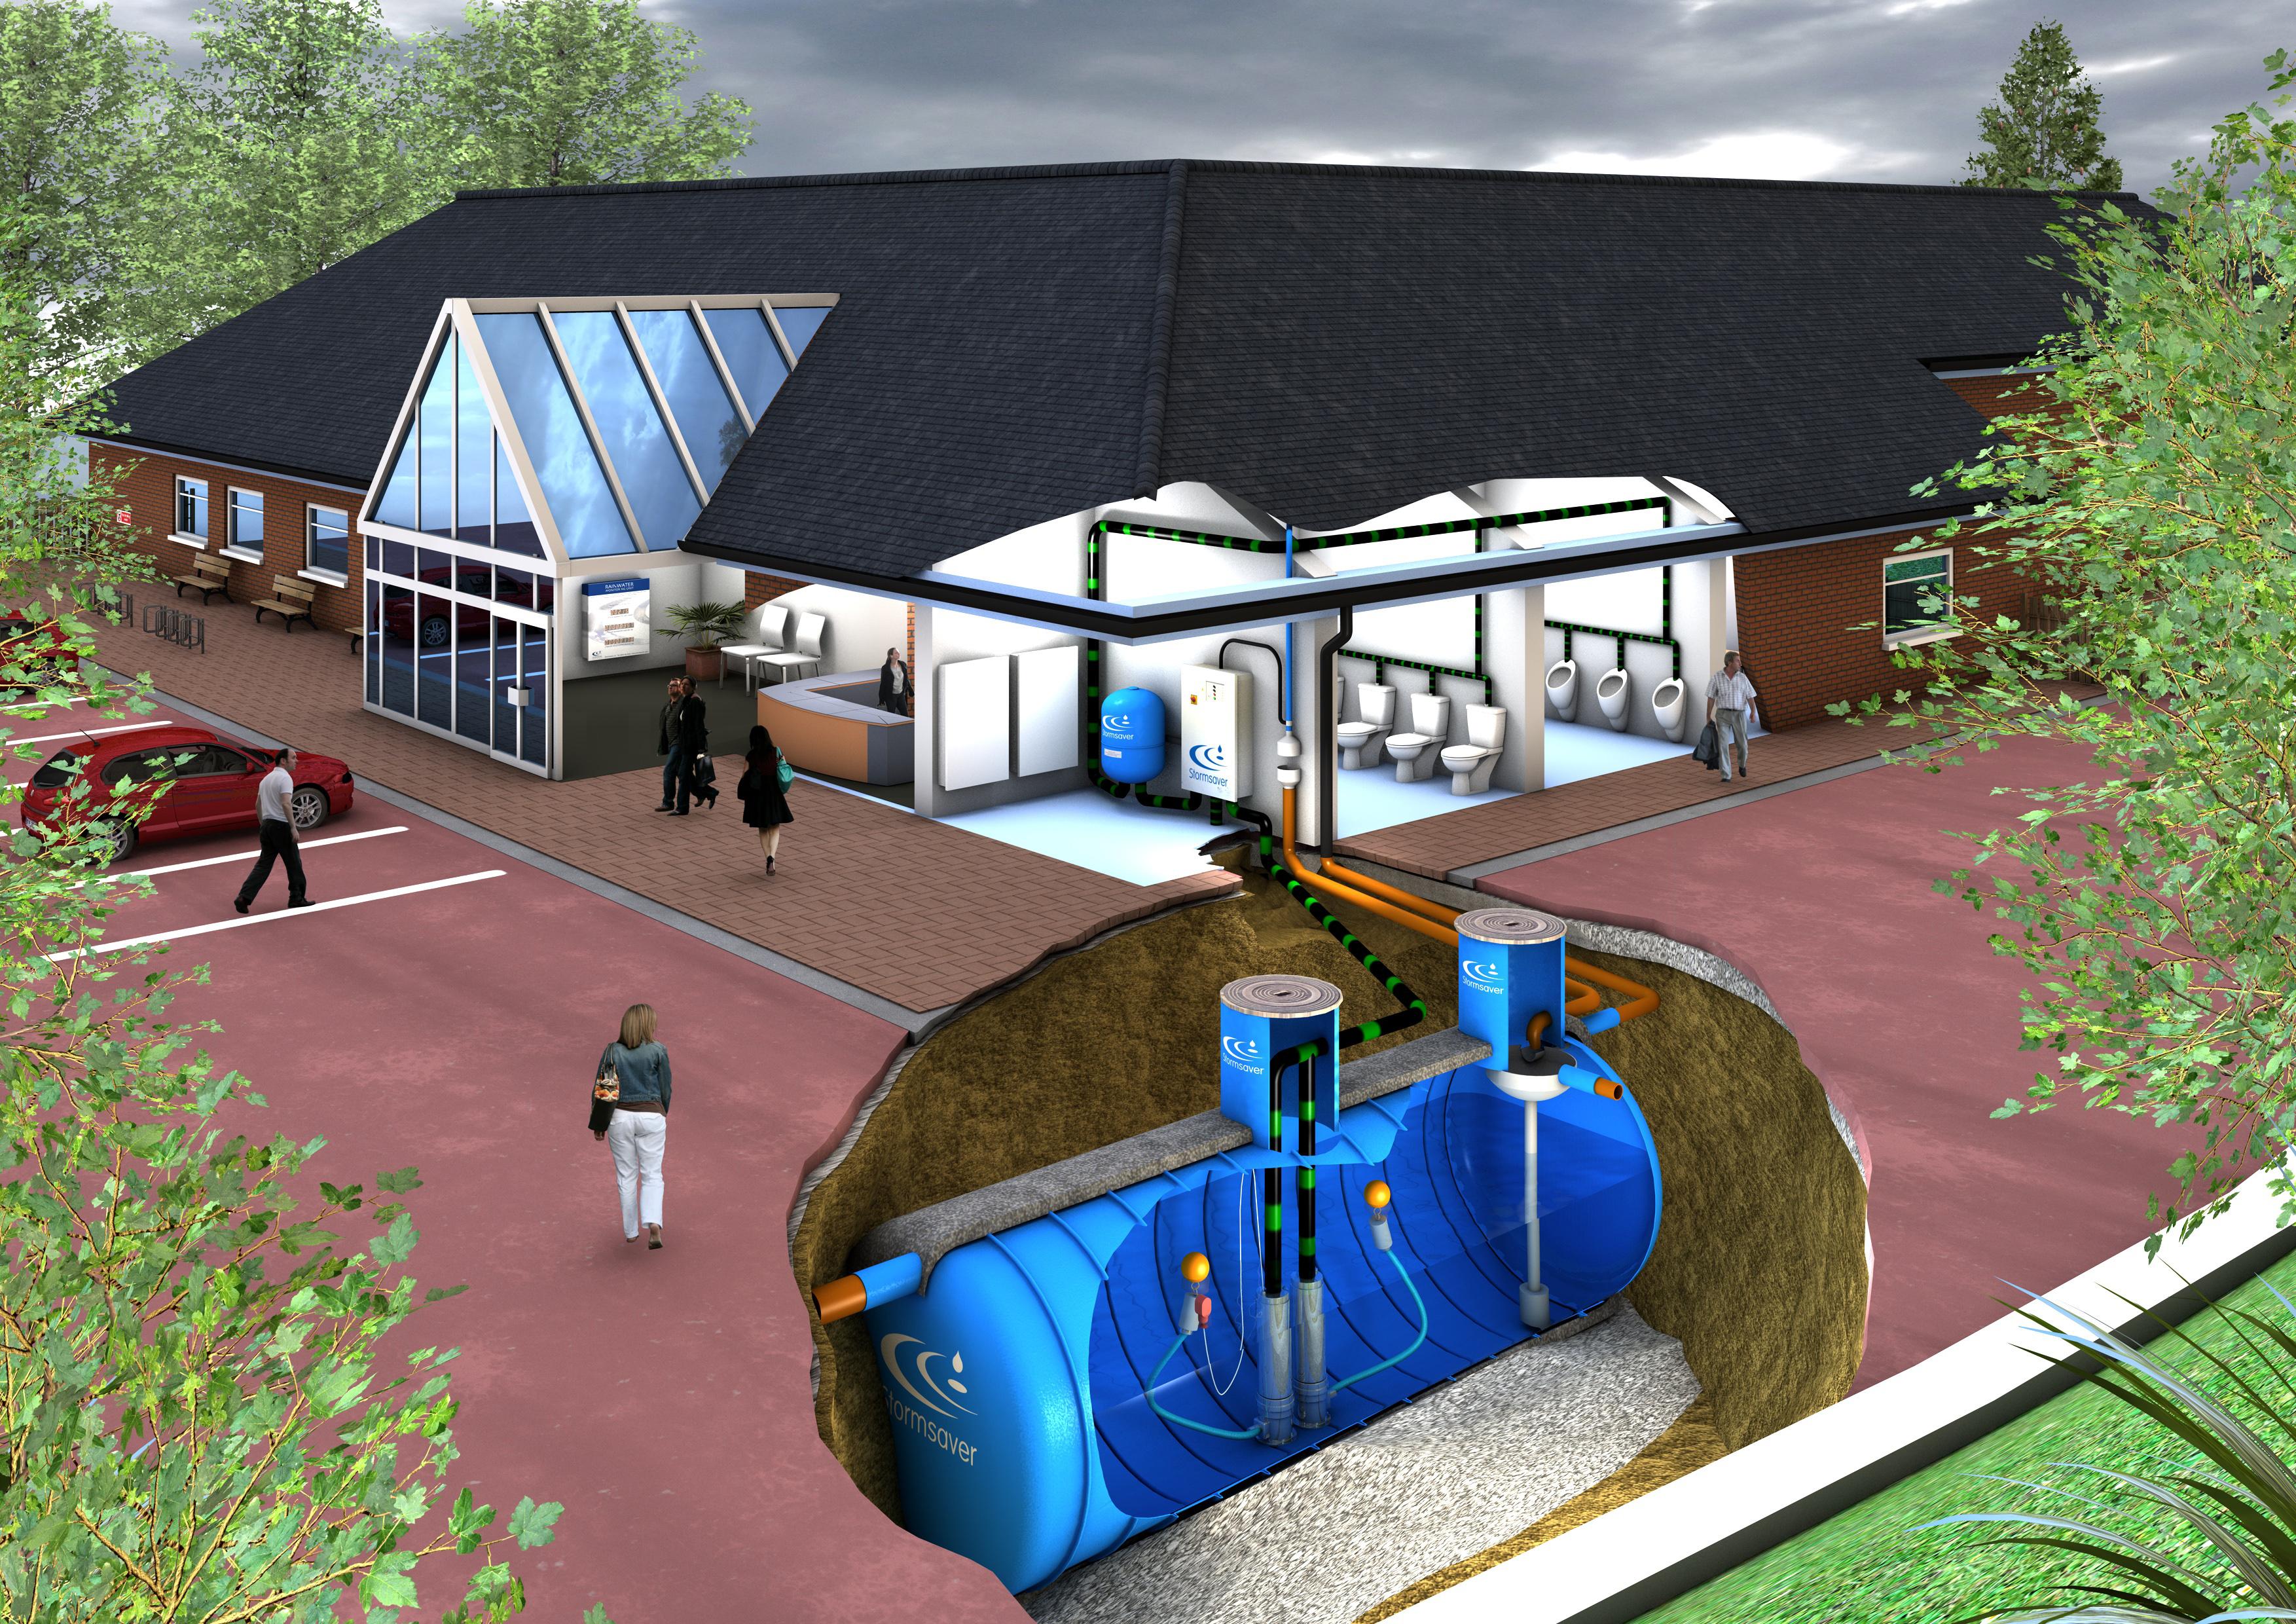 Description rainwater harvesting system jpg - Rainwater Storage